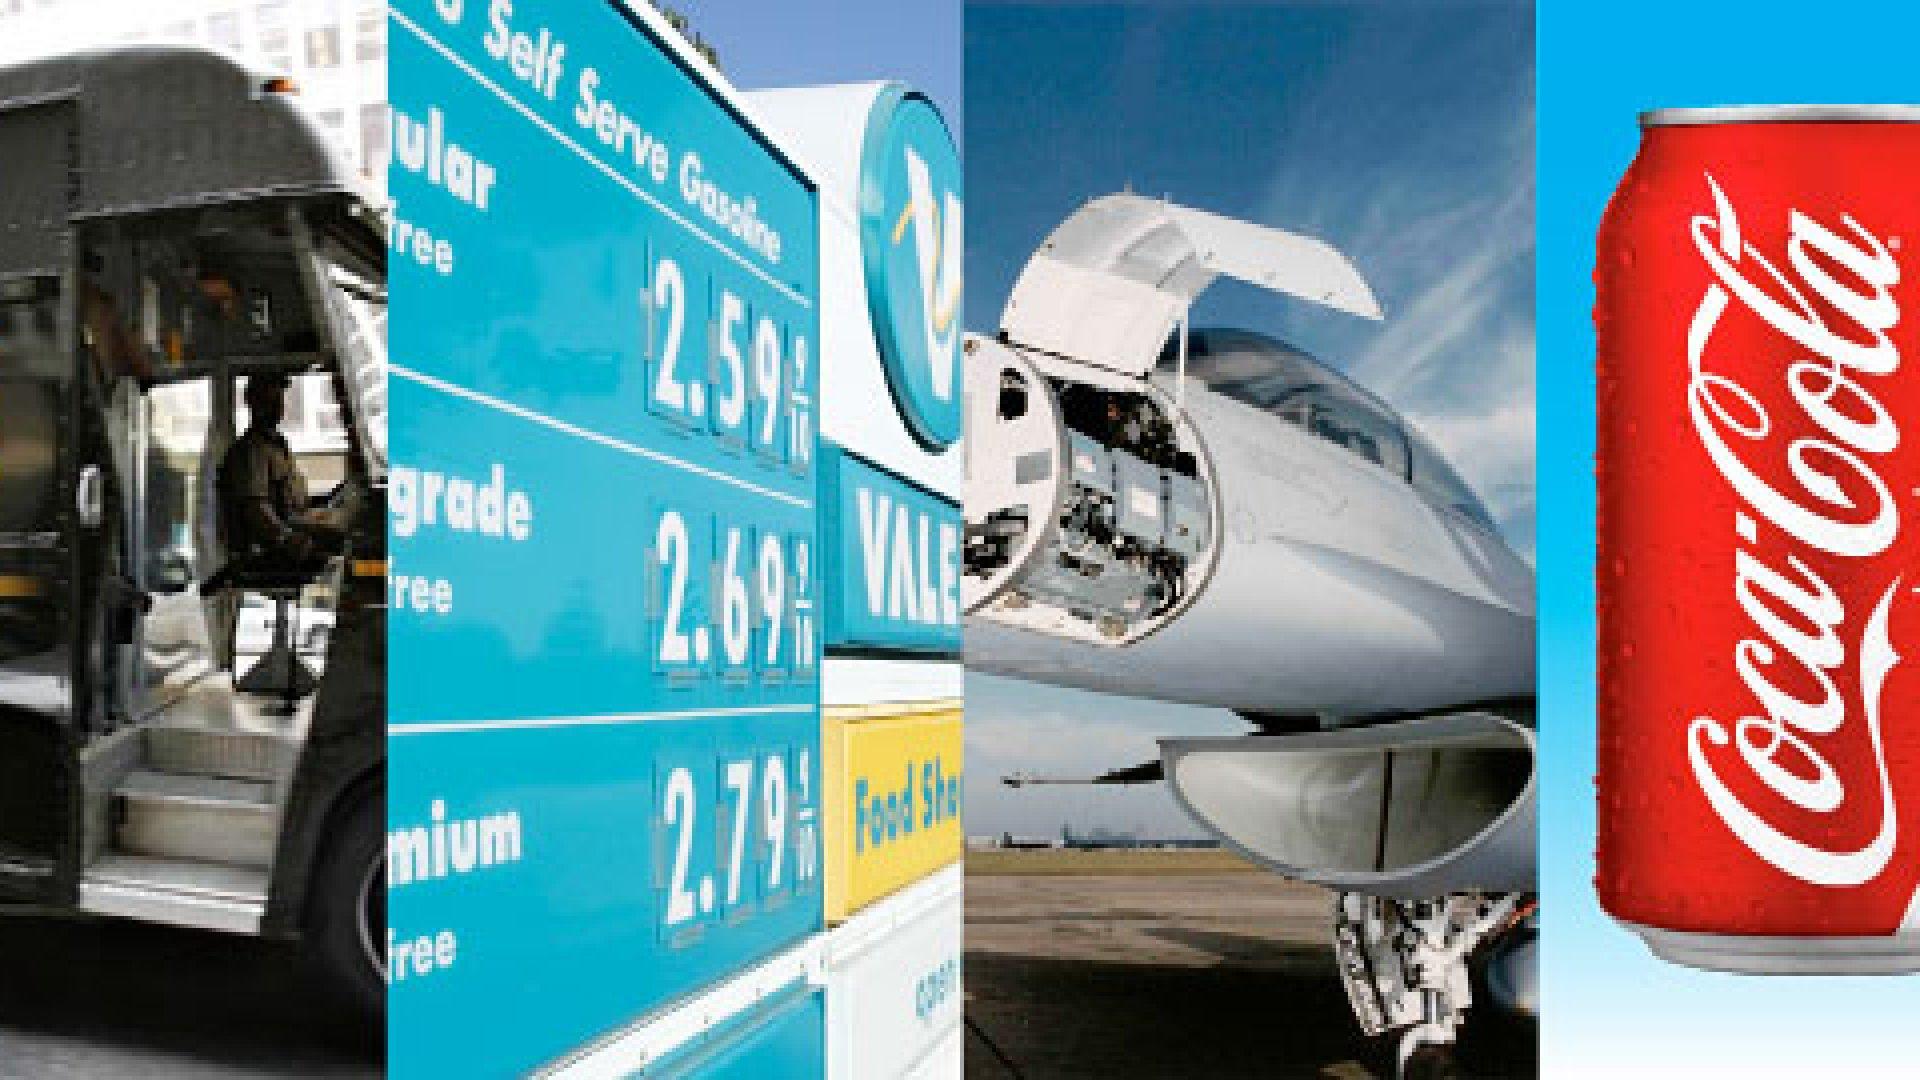 <strong>TACTICS:</strong> UPS; Valero Energy; Northrop Grumman; Coca-Cola